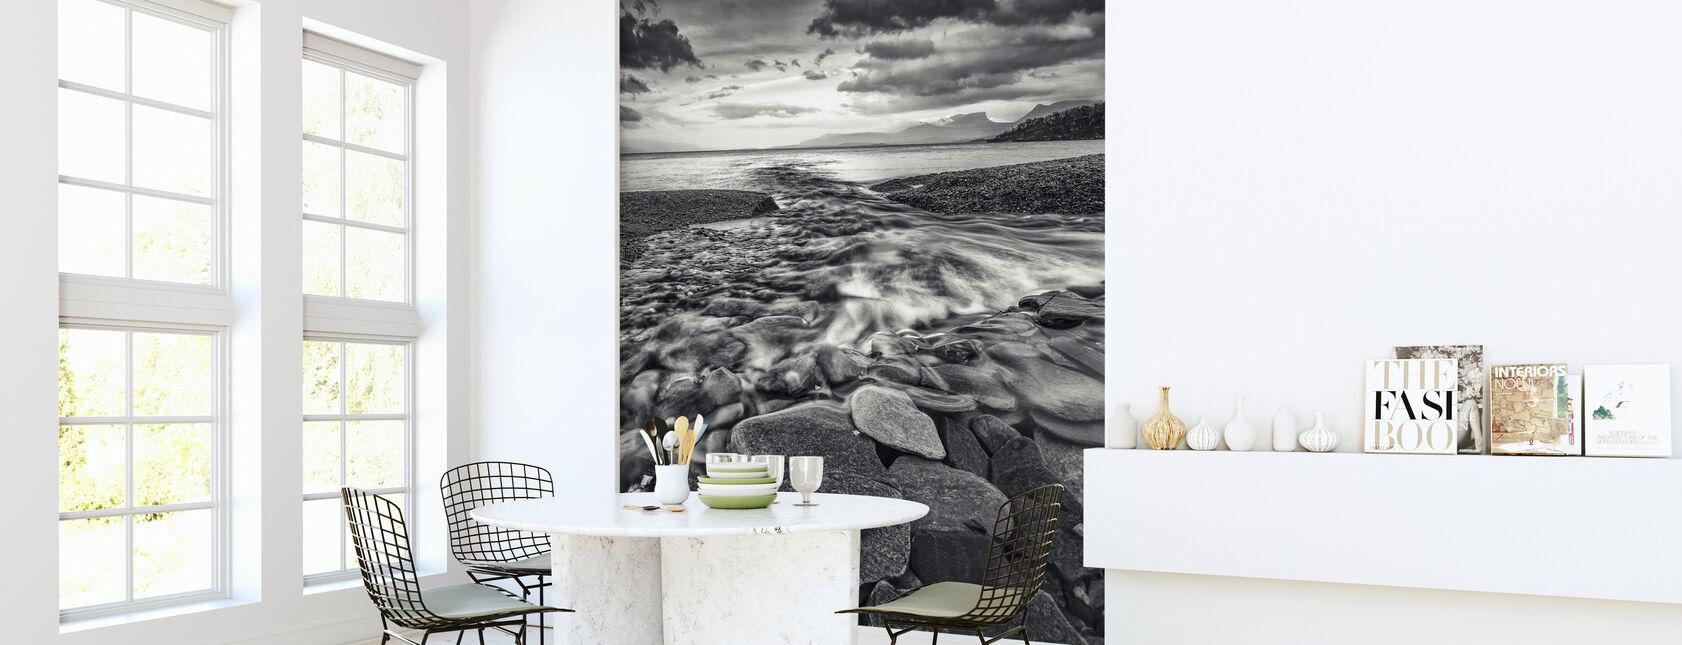 Torneträsk, Lapland - Sweden - Wallpaper - Kitchen